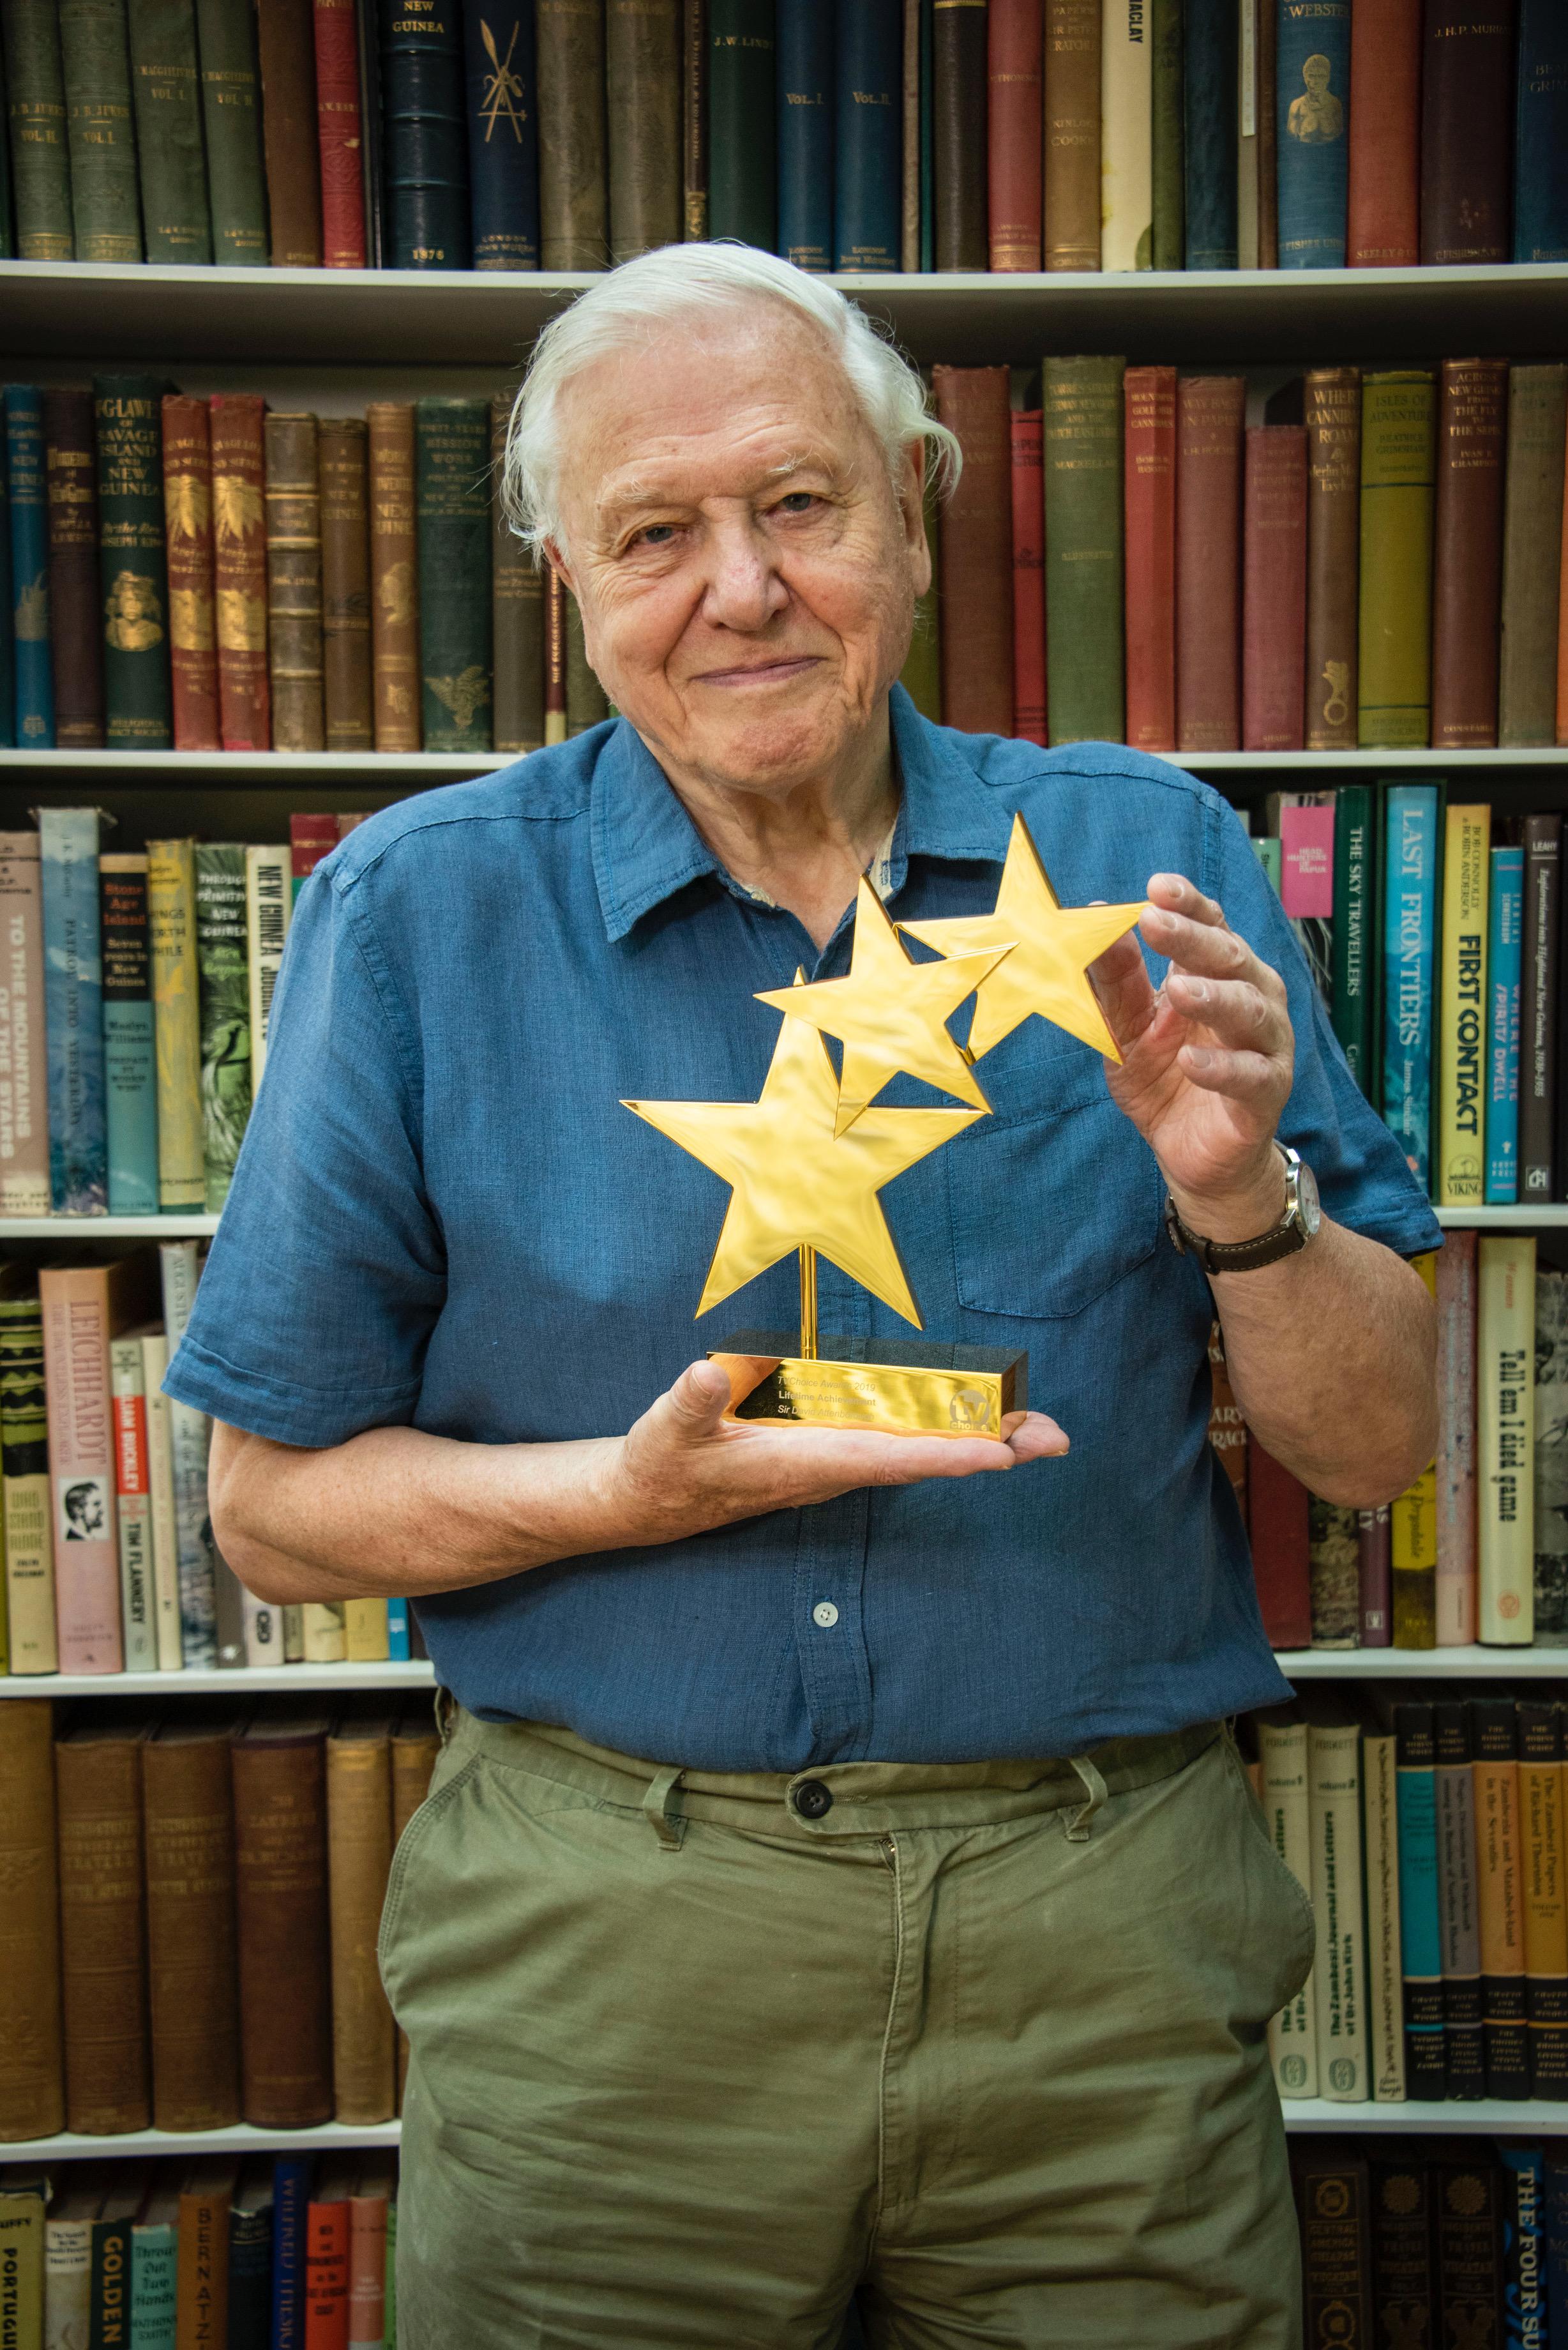 Sir David Attenborough TV Choice Lifetime Achievement Award 2019.jpg